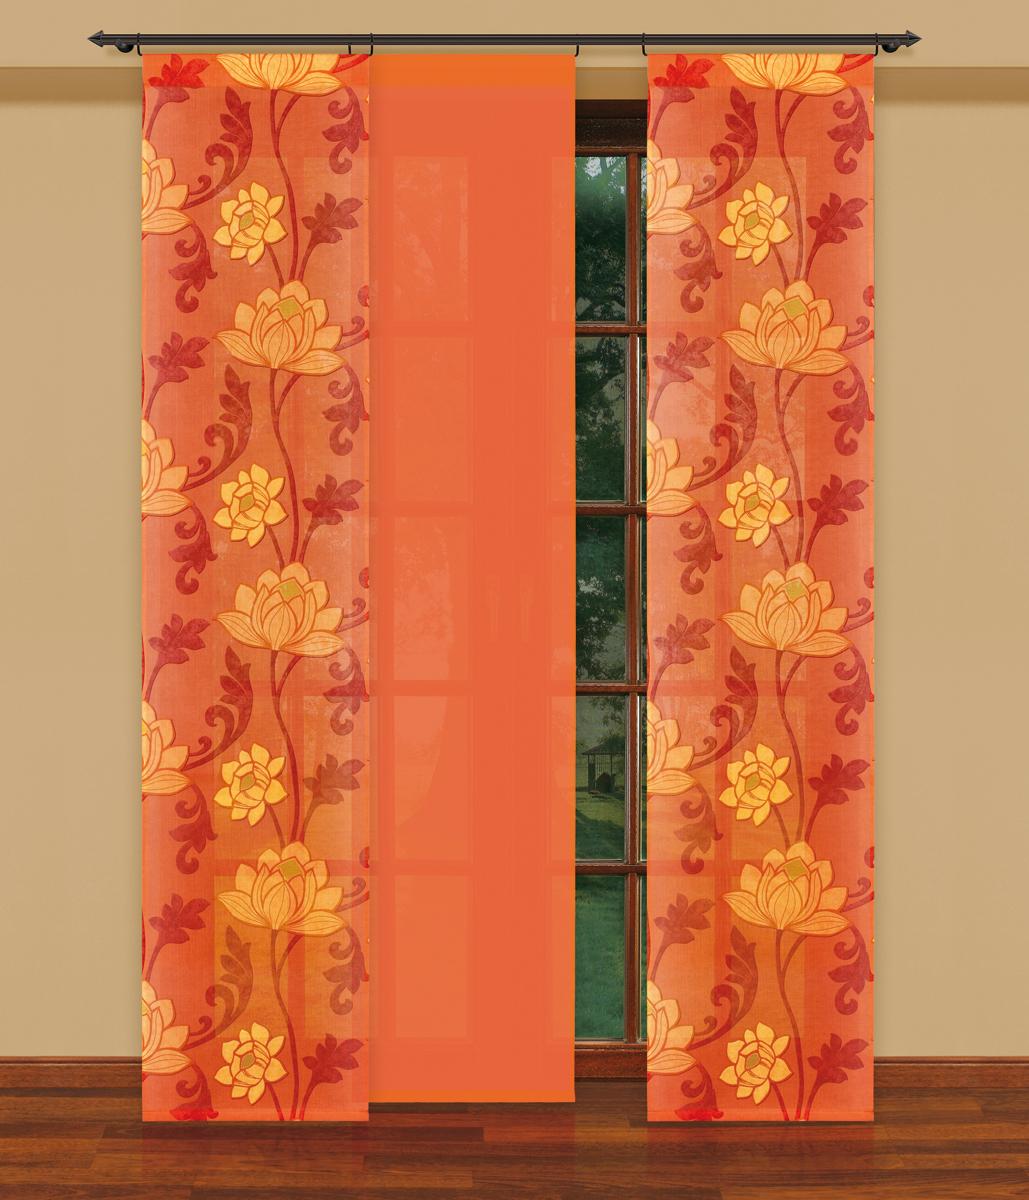 Гардина HAFT 250*50*3. 202240/50 оранжевый202240/50 оранжевыйГардина XAFT 250*50*3. 202240/50 оранжевый Материал: 100% п/э, размер: 250*50*3, цвет: оранжевый